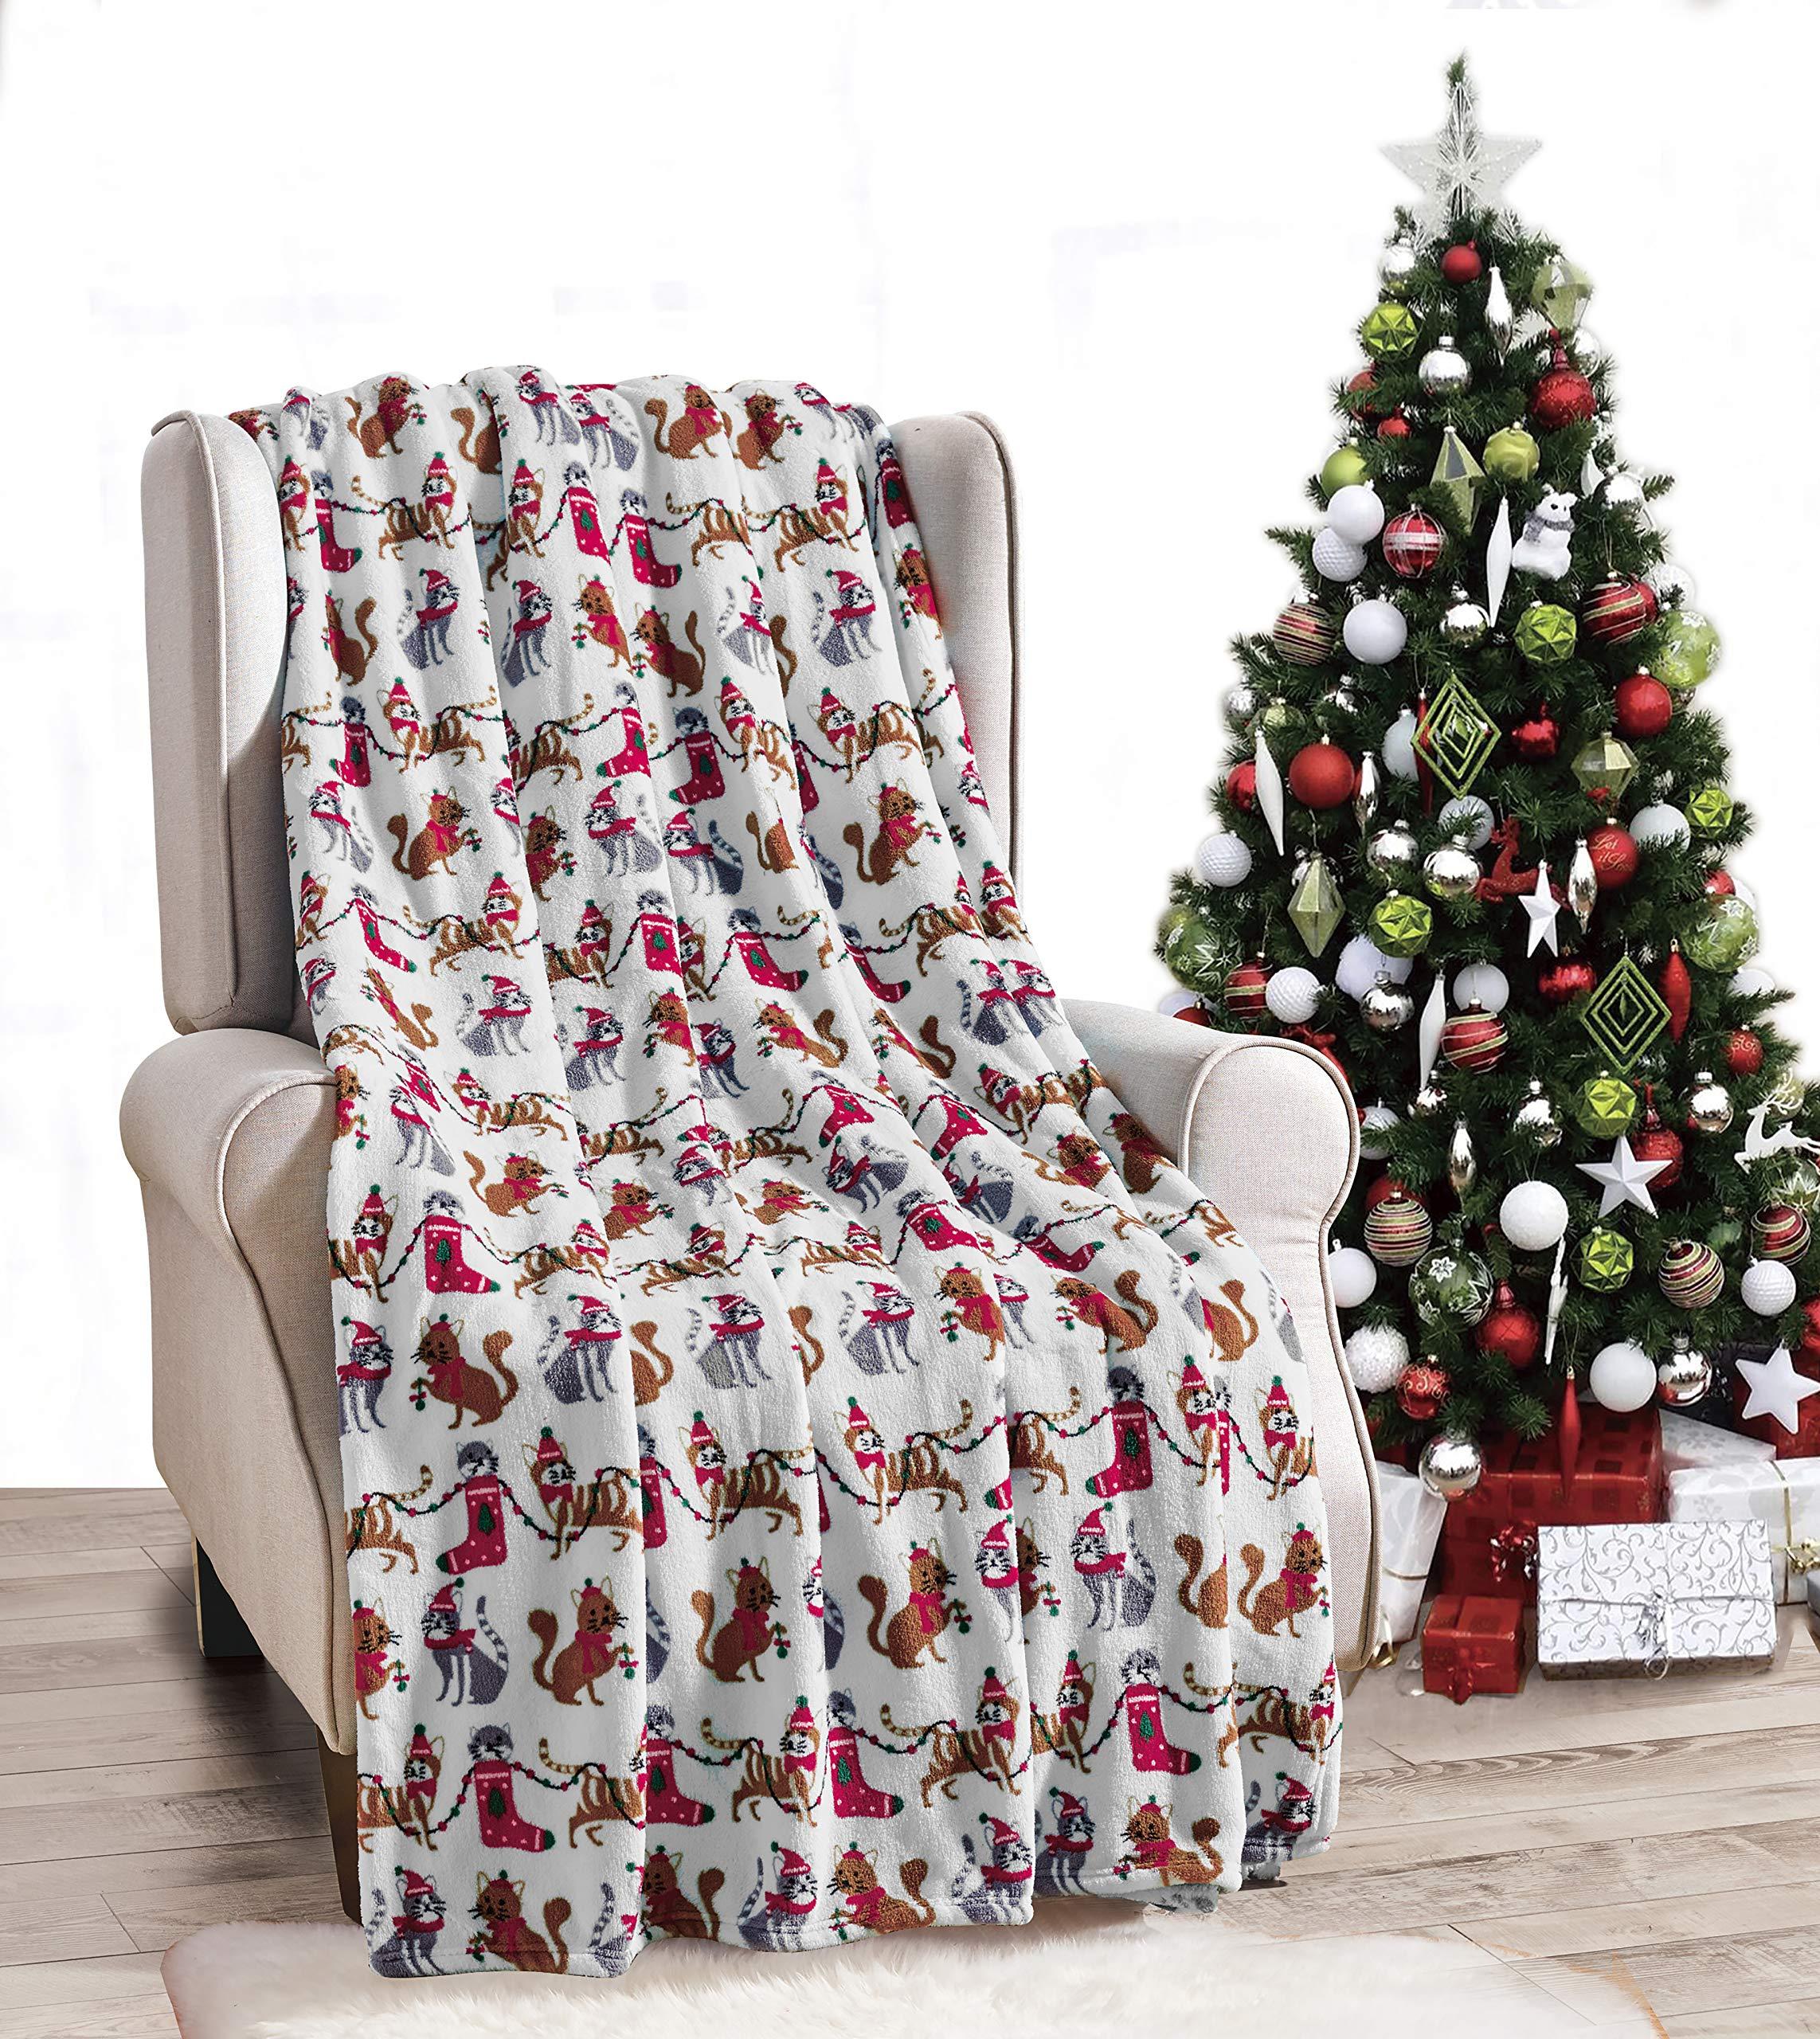 Cat Holiday Blanket Christmas Cat Blanket for Cat Personalized Cat Blanket Holiday Gift for Cat Cat Bed Christmas Gift for Cat